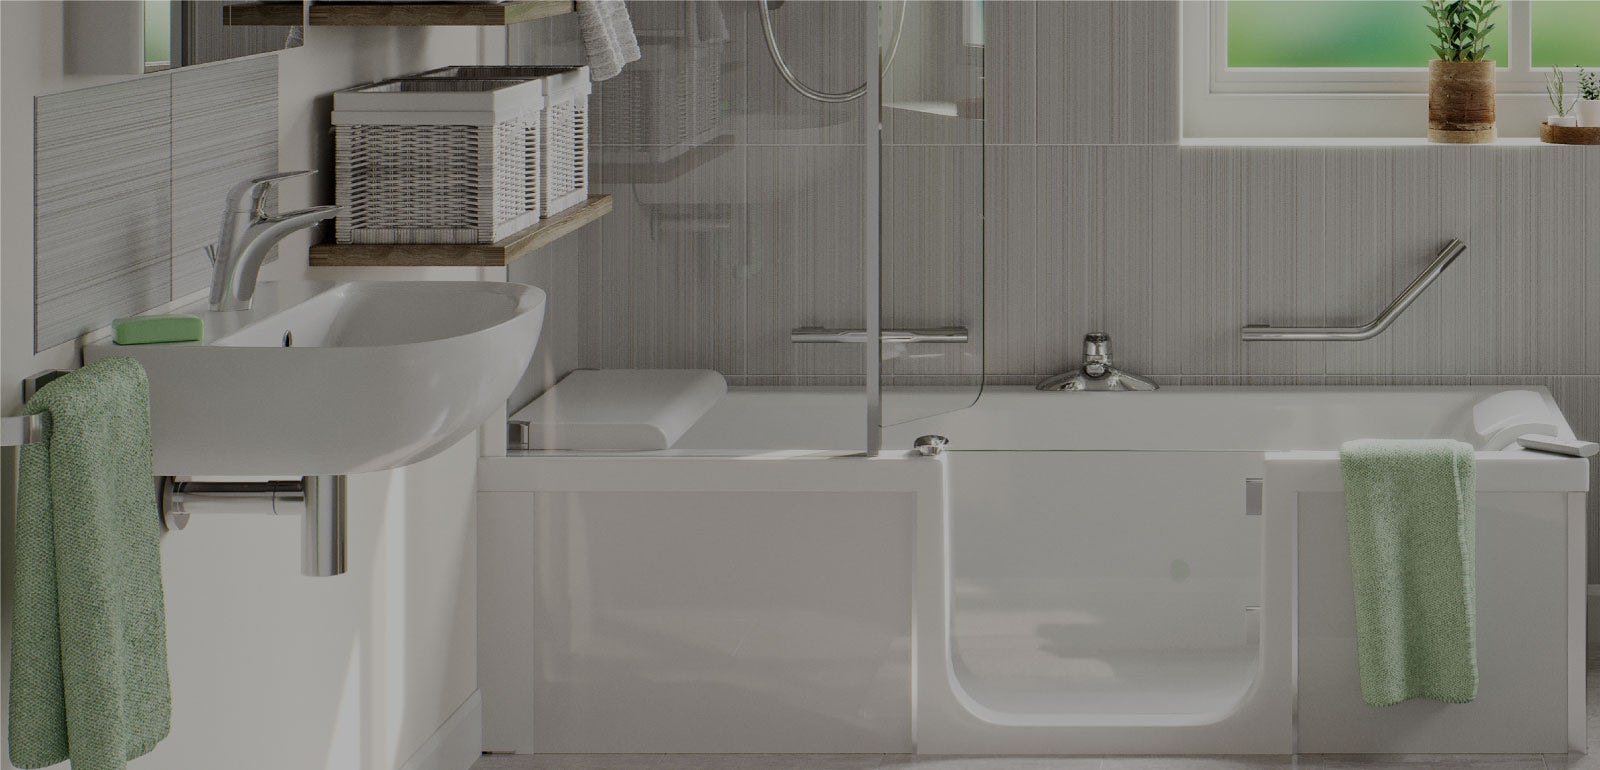 Grab Rails Ing Guide Victoriaplum Com, How To Fit Bathroom Grab Rails